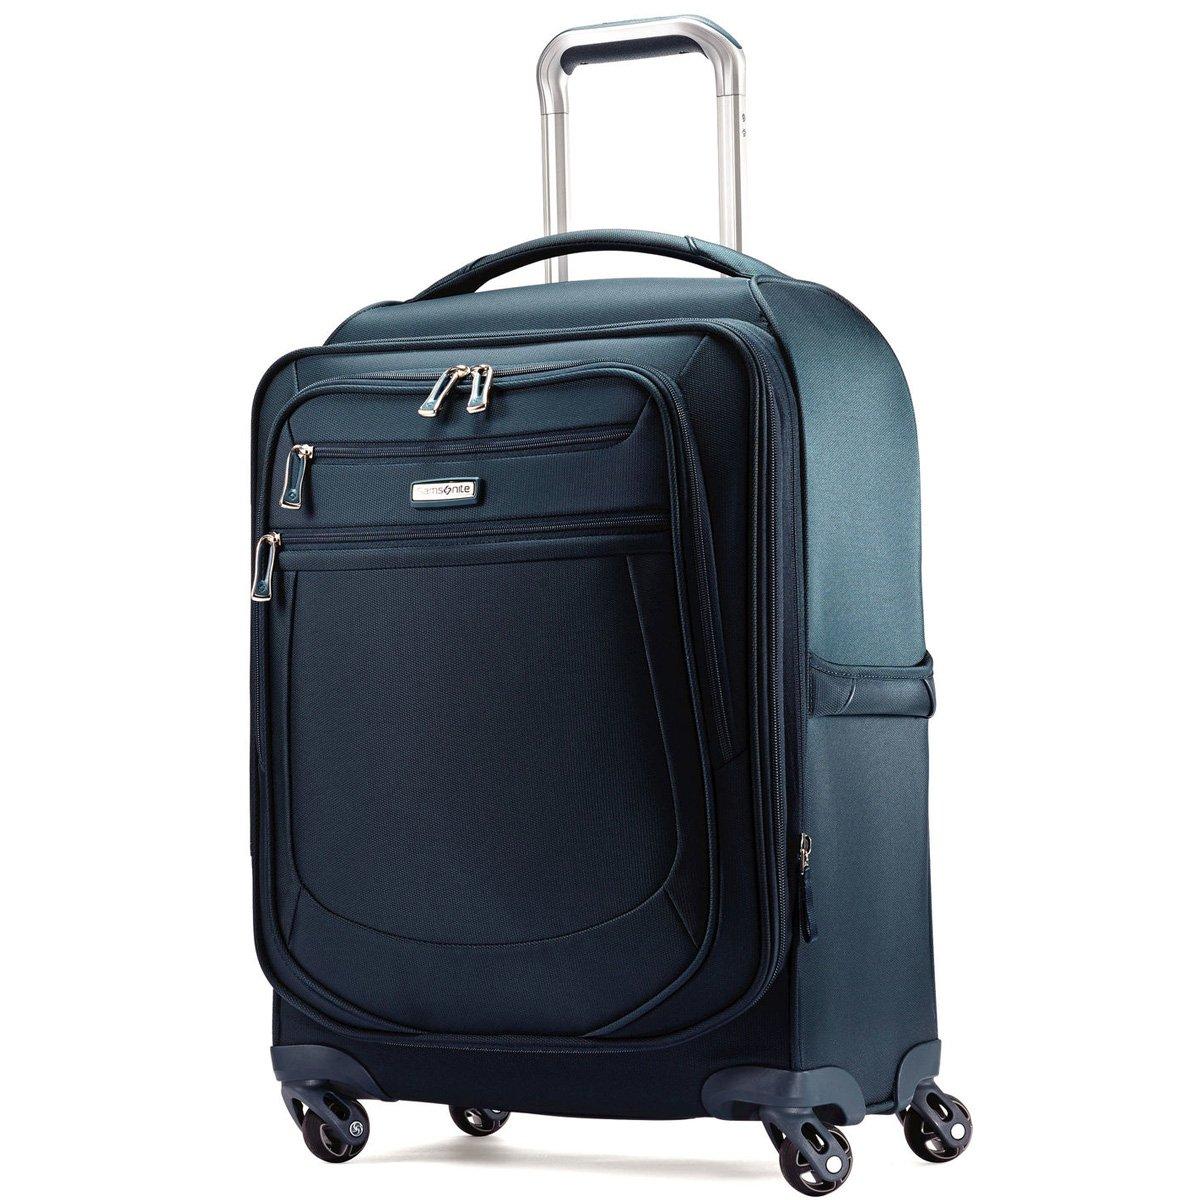 Samsonite Mightlight 2 Softside Spinner 21 Suitcases, Majolica Blue by Samsonite